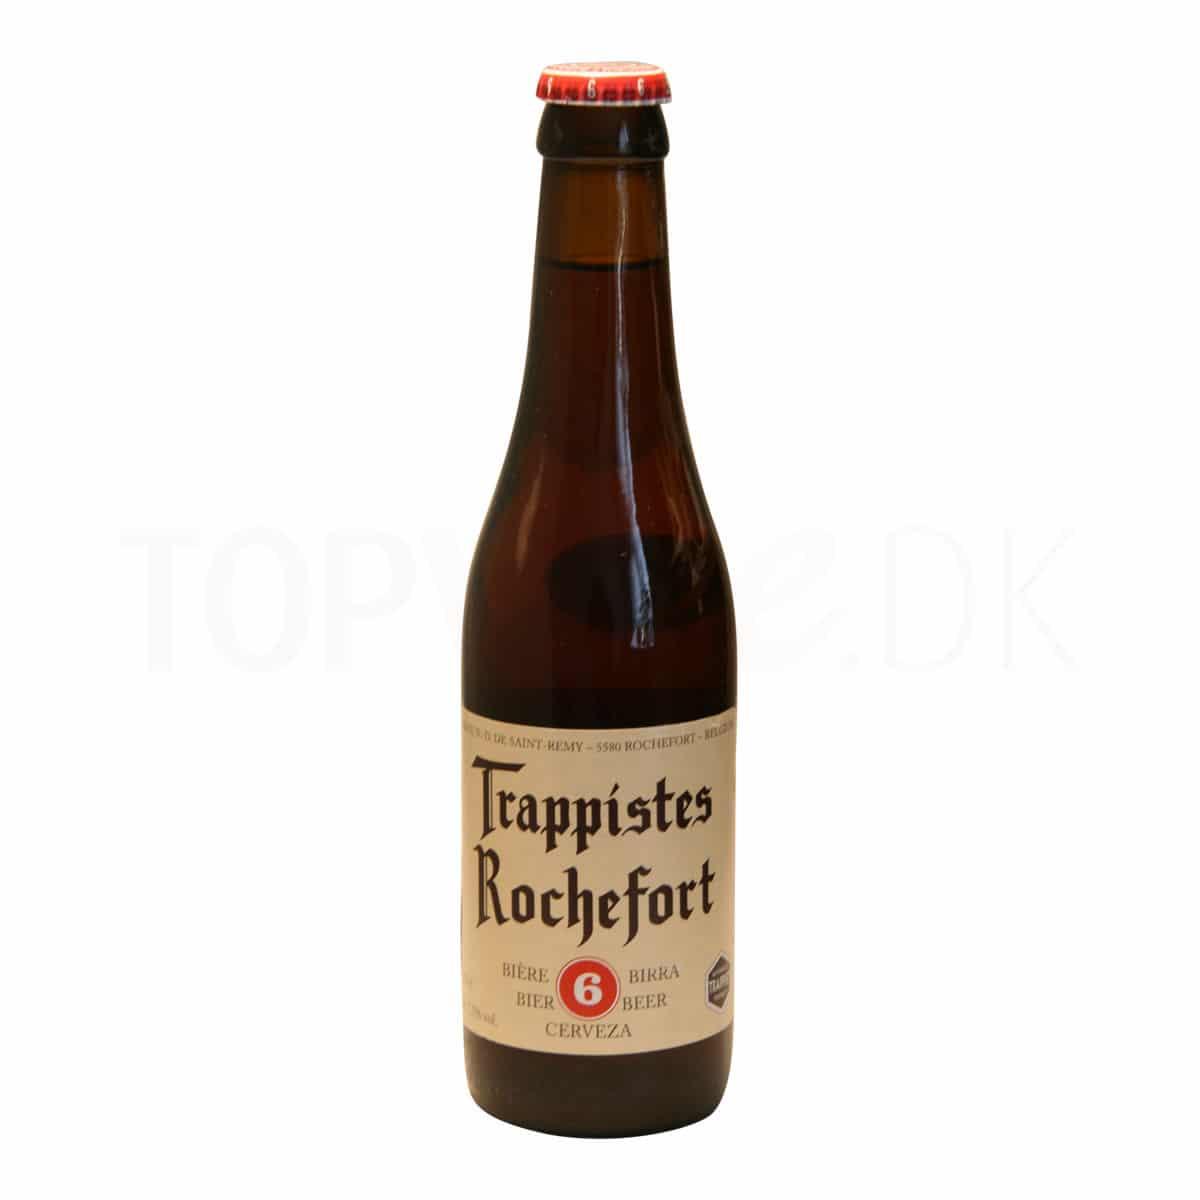 Topvine Trappistes Rochefort 6